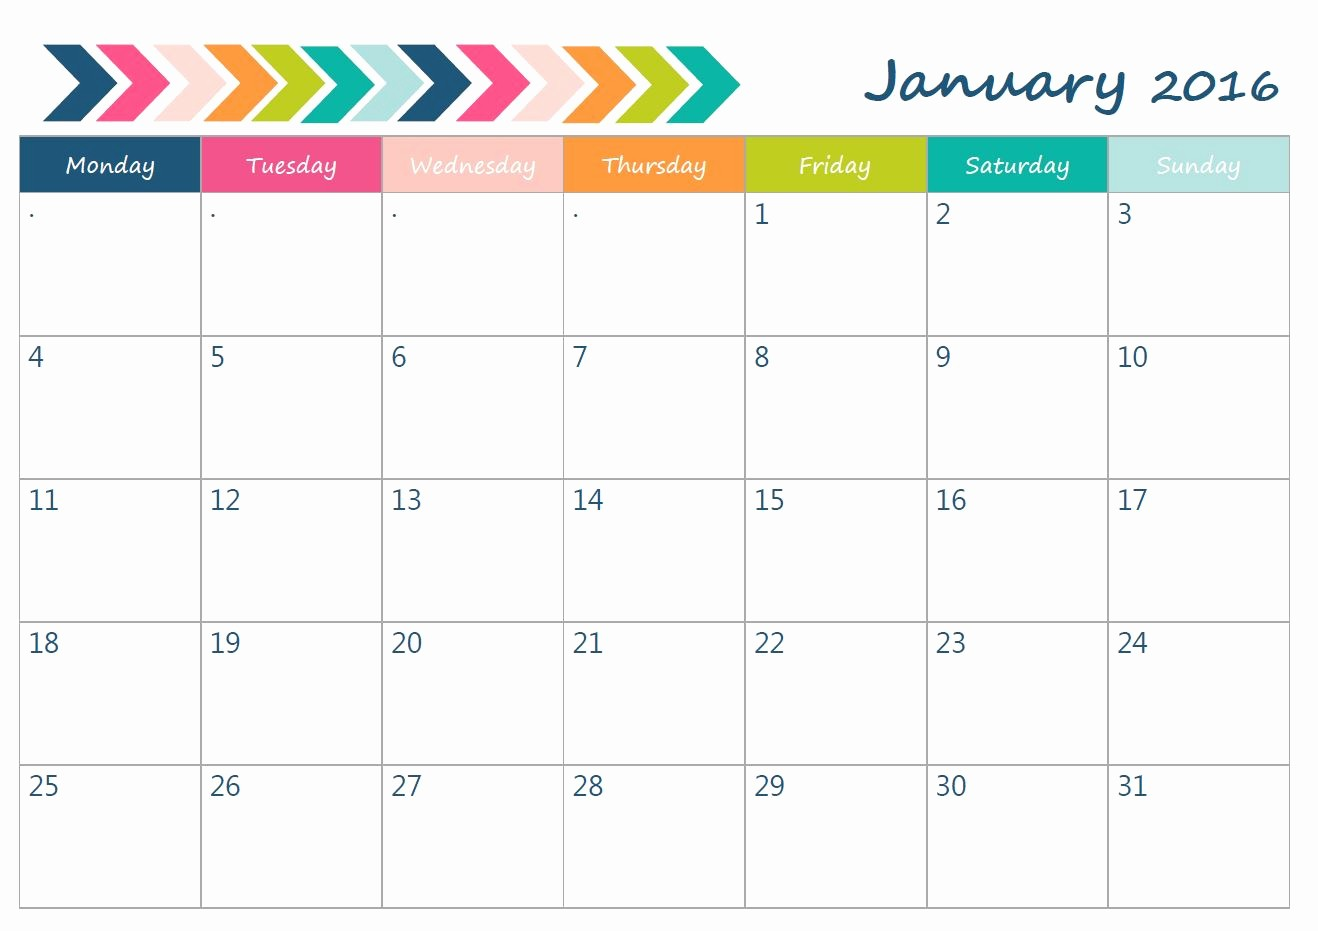 3 Month Calendar 2016 Template Beautiful Free Printable 3 Month Calendar 2016